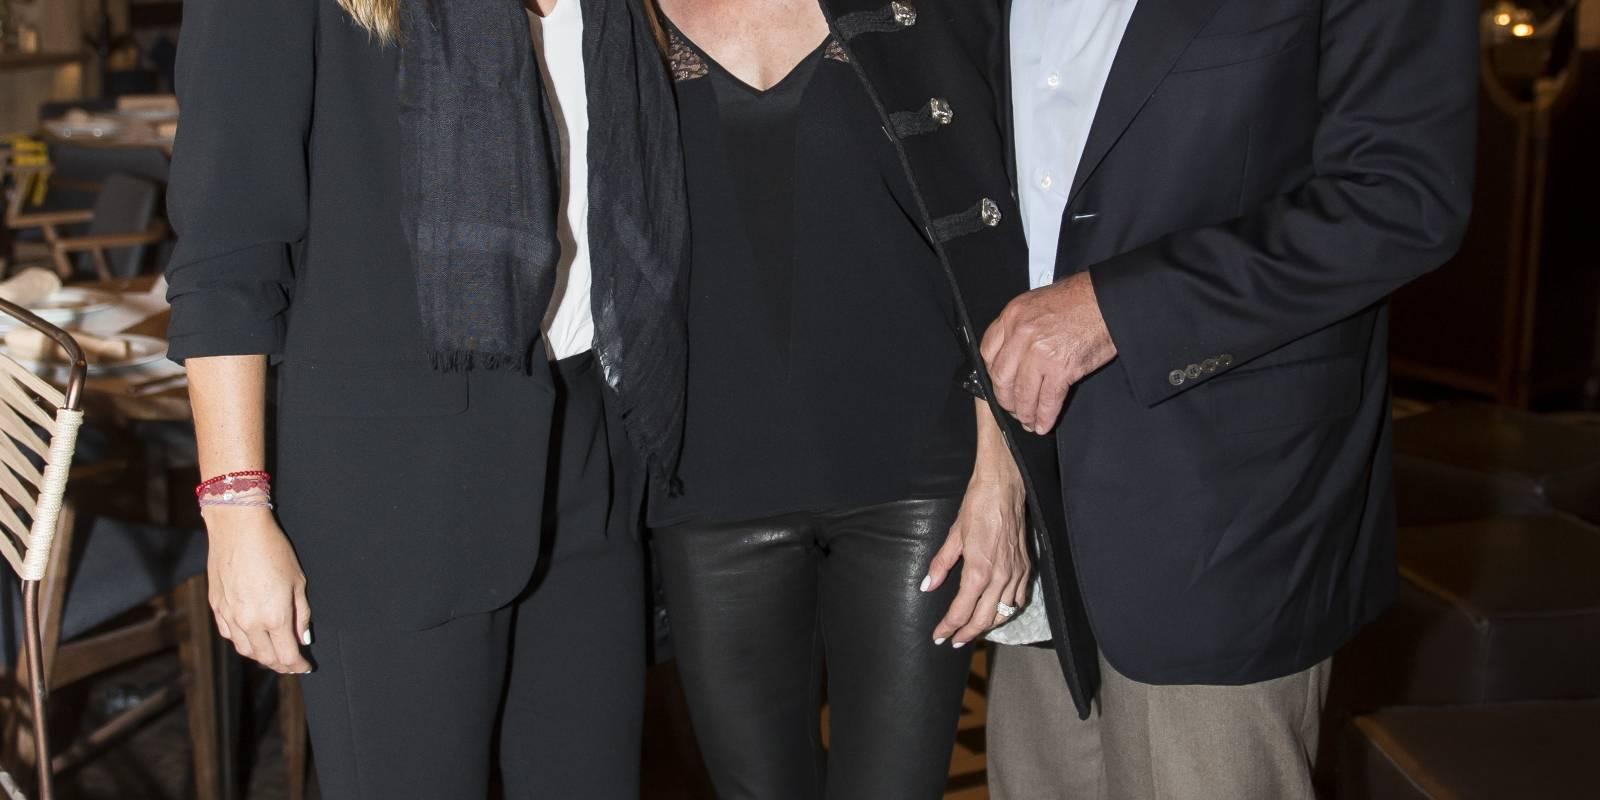 Lorenza Bernot, Marta Correa y Carlos Rivera JDS